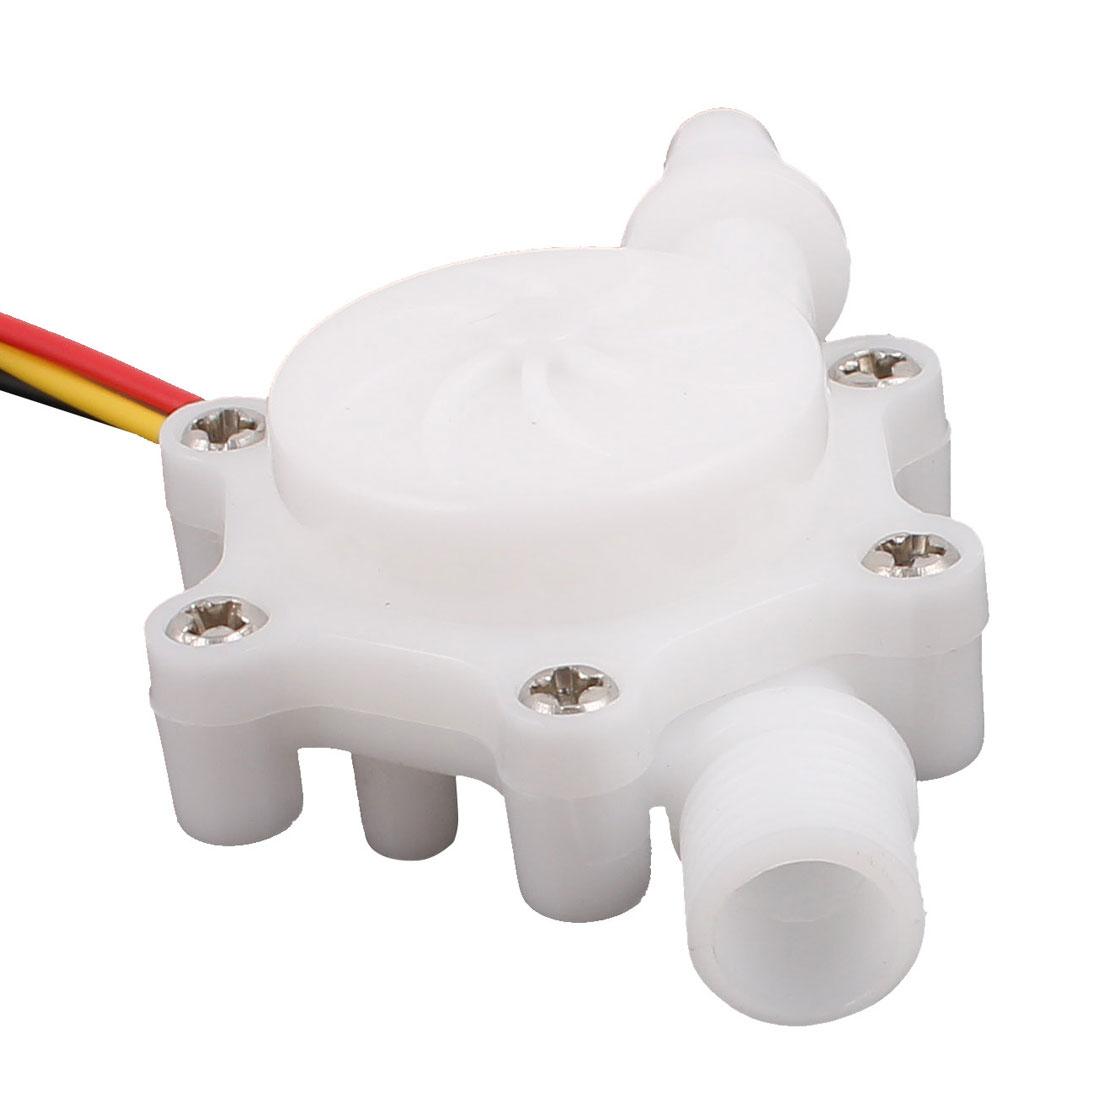 "0.15-1.5L/min G1/4"" Male Thread 6mm Outlet OD Water Flow Sensor SEN-HZ06FB"